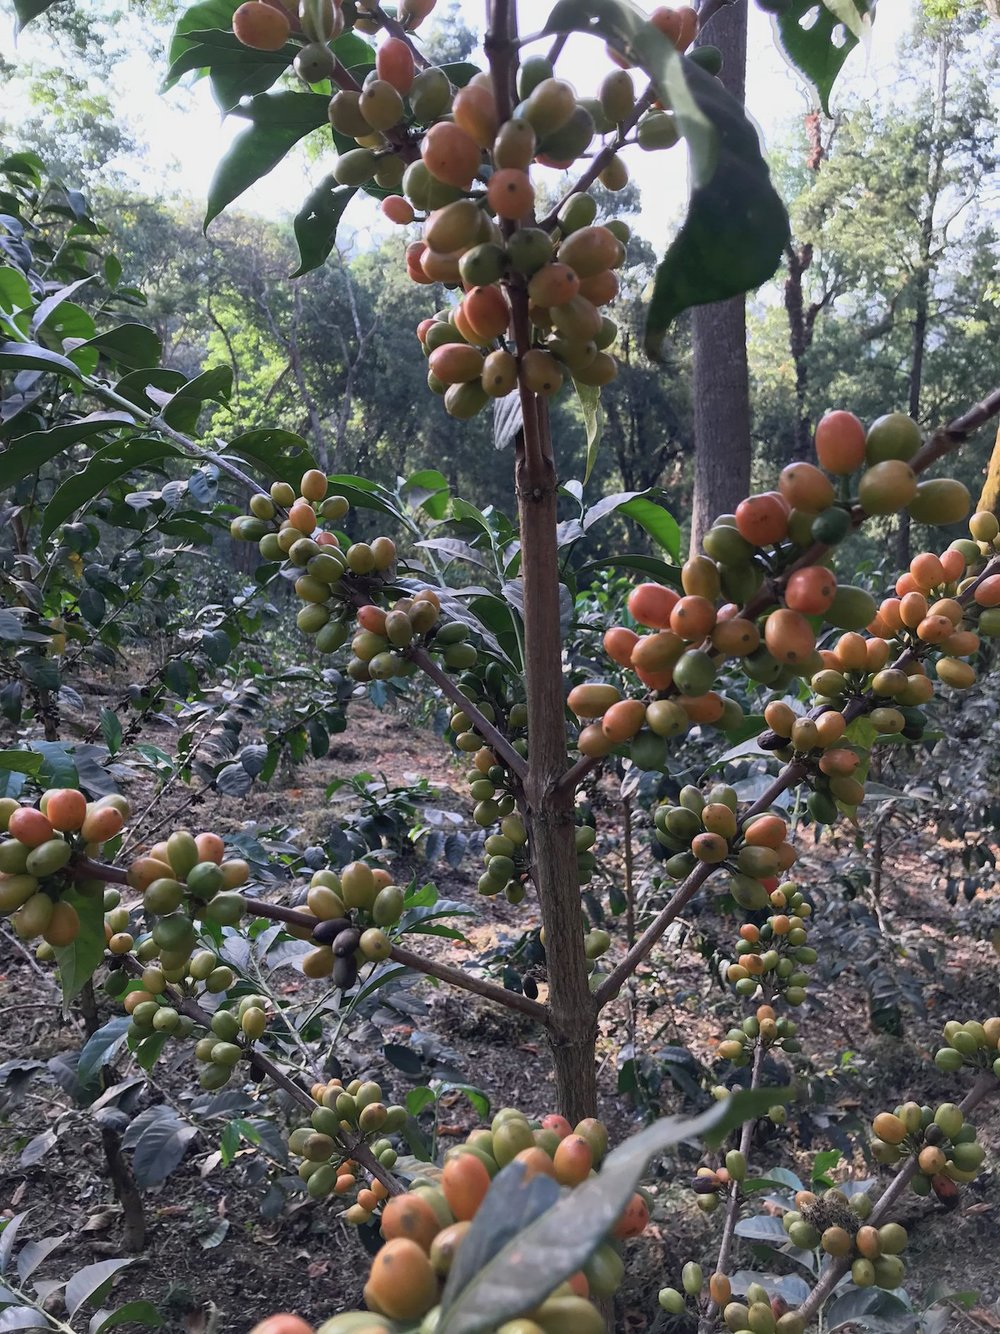 The biodiversity of coffee in Ethiopia is astounding